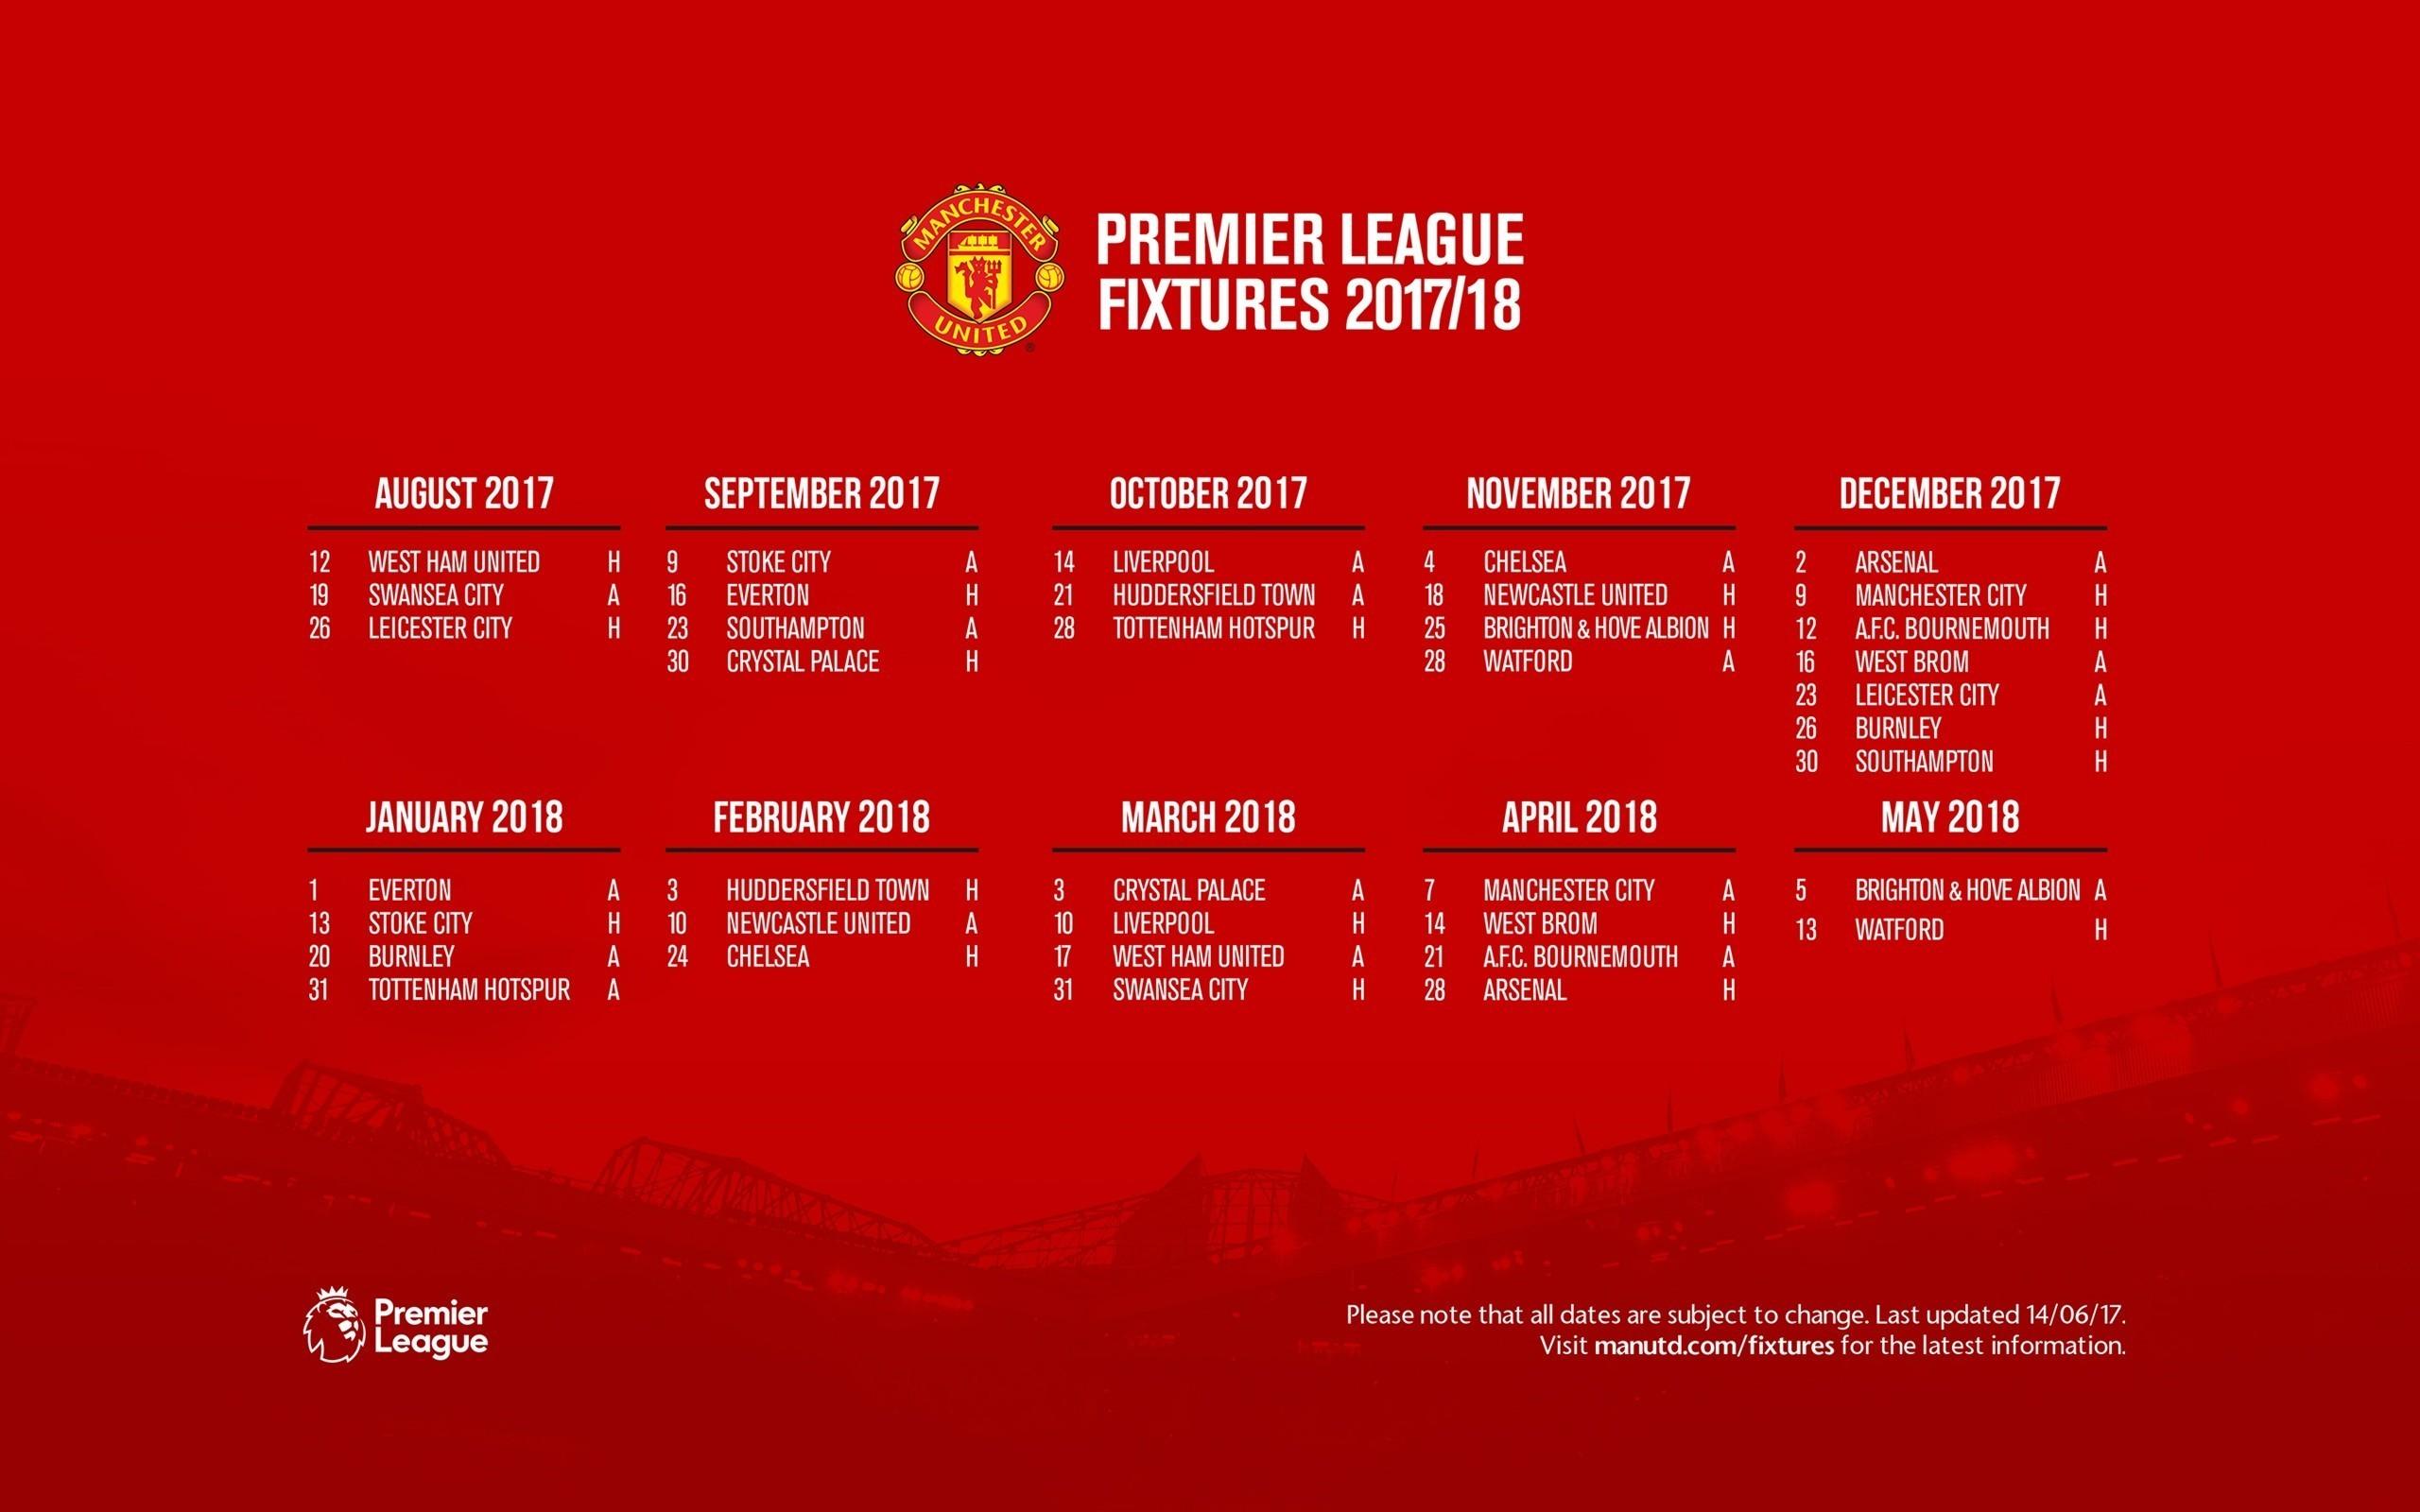 Desktop Wallpaper Calendar February 2018 (47+ images)